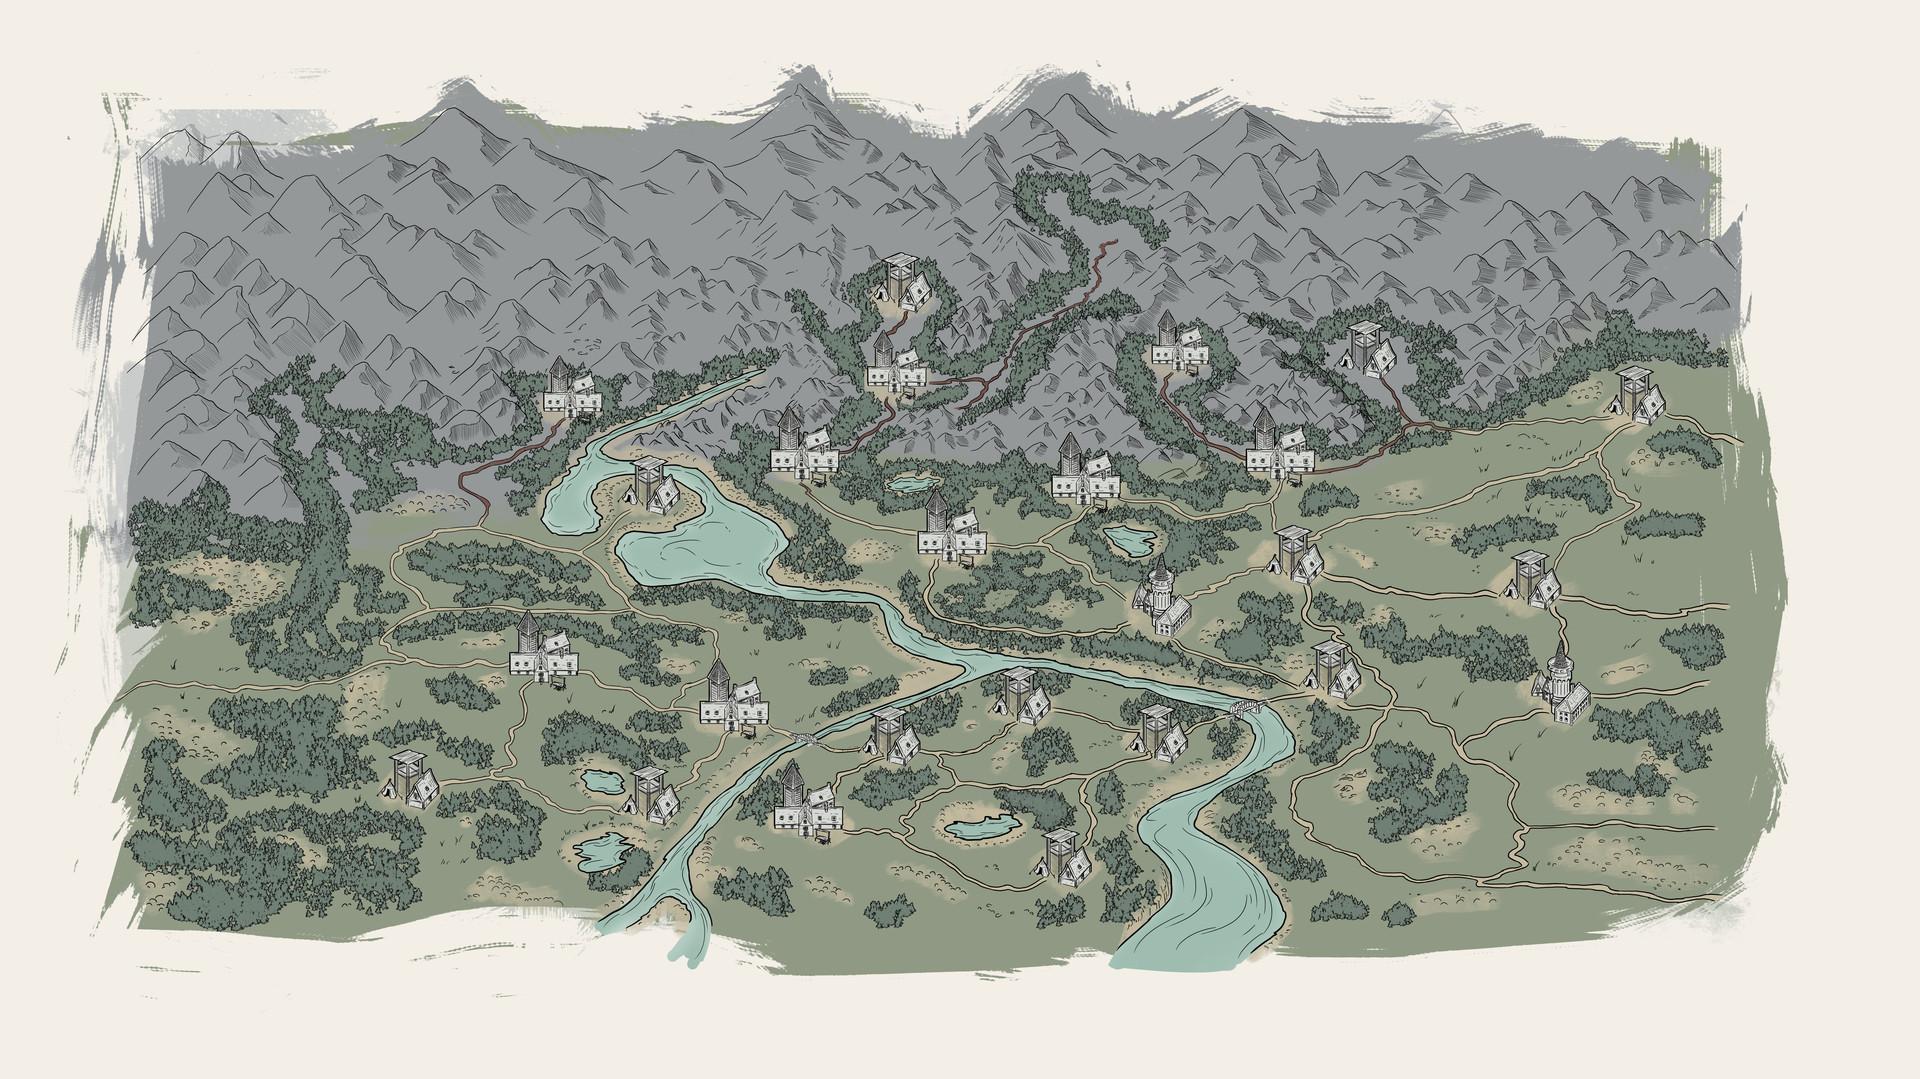 Konrad langa rsz main map5 color